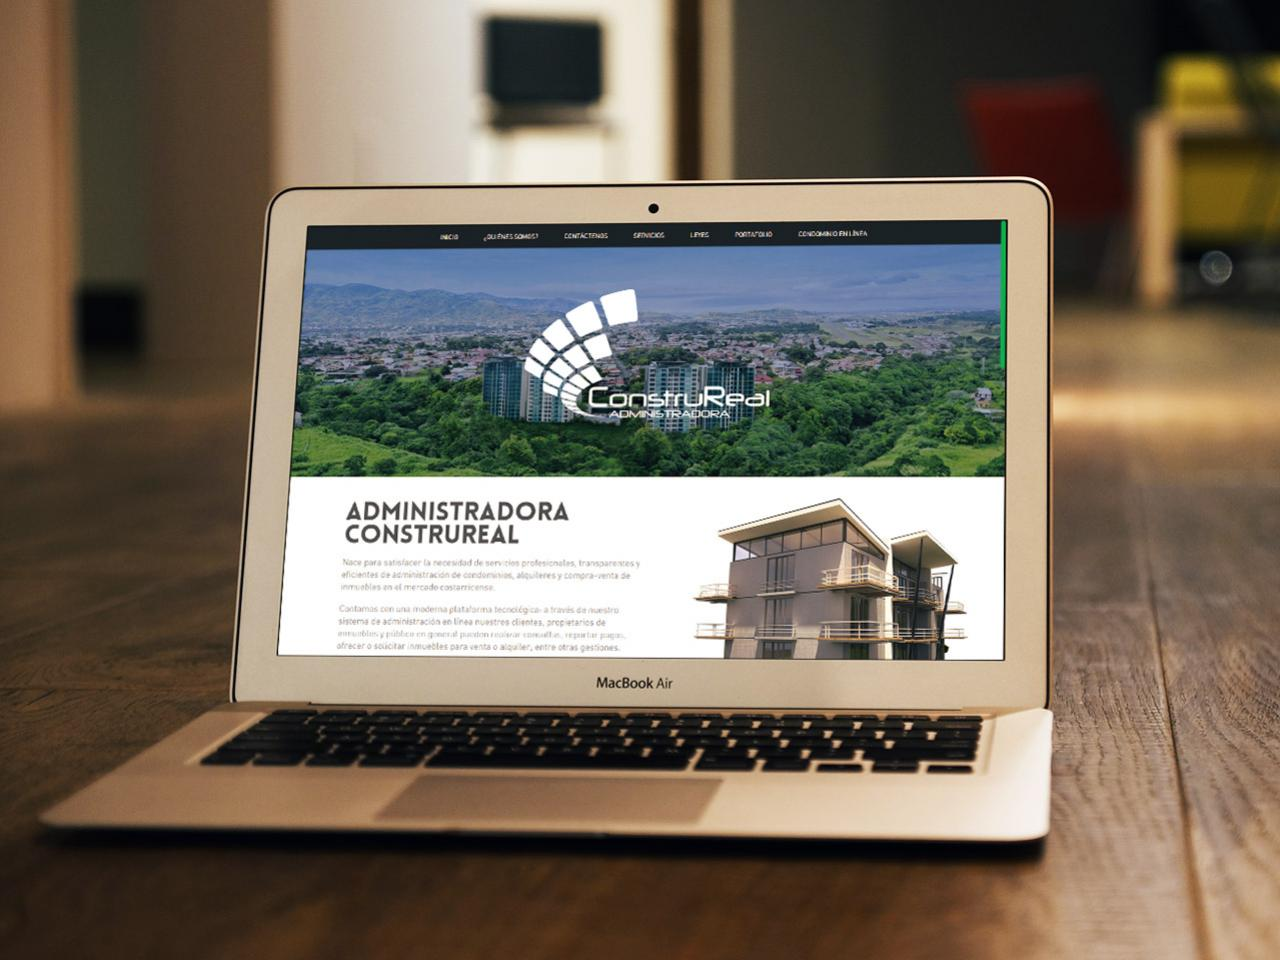 Imagen de Administradora Construreal Costa Rica por Movidagrafica